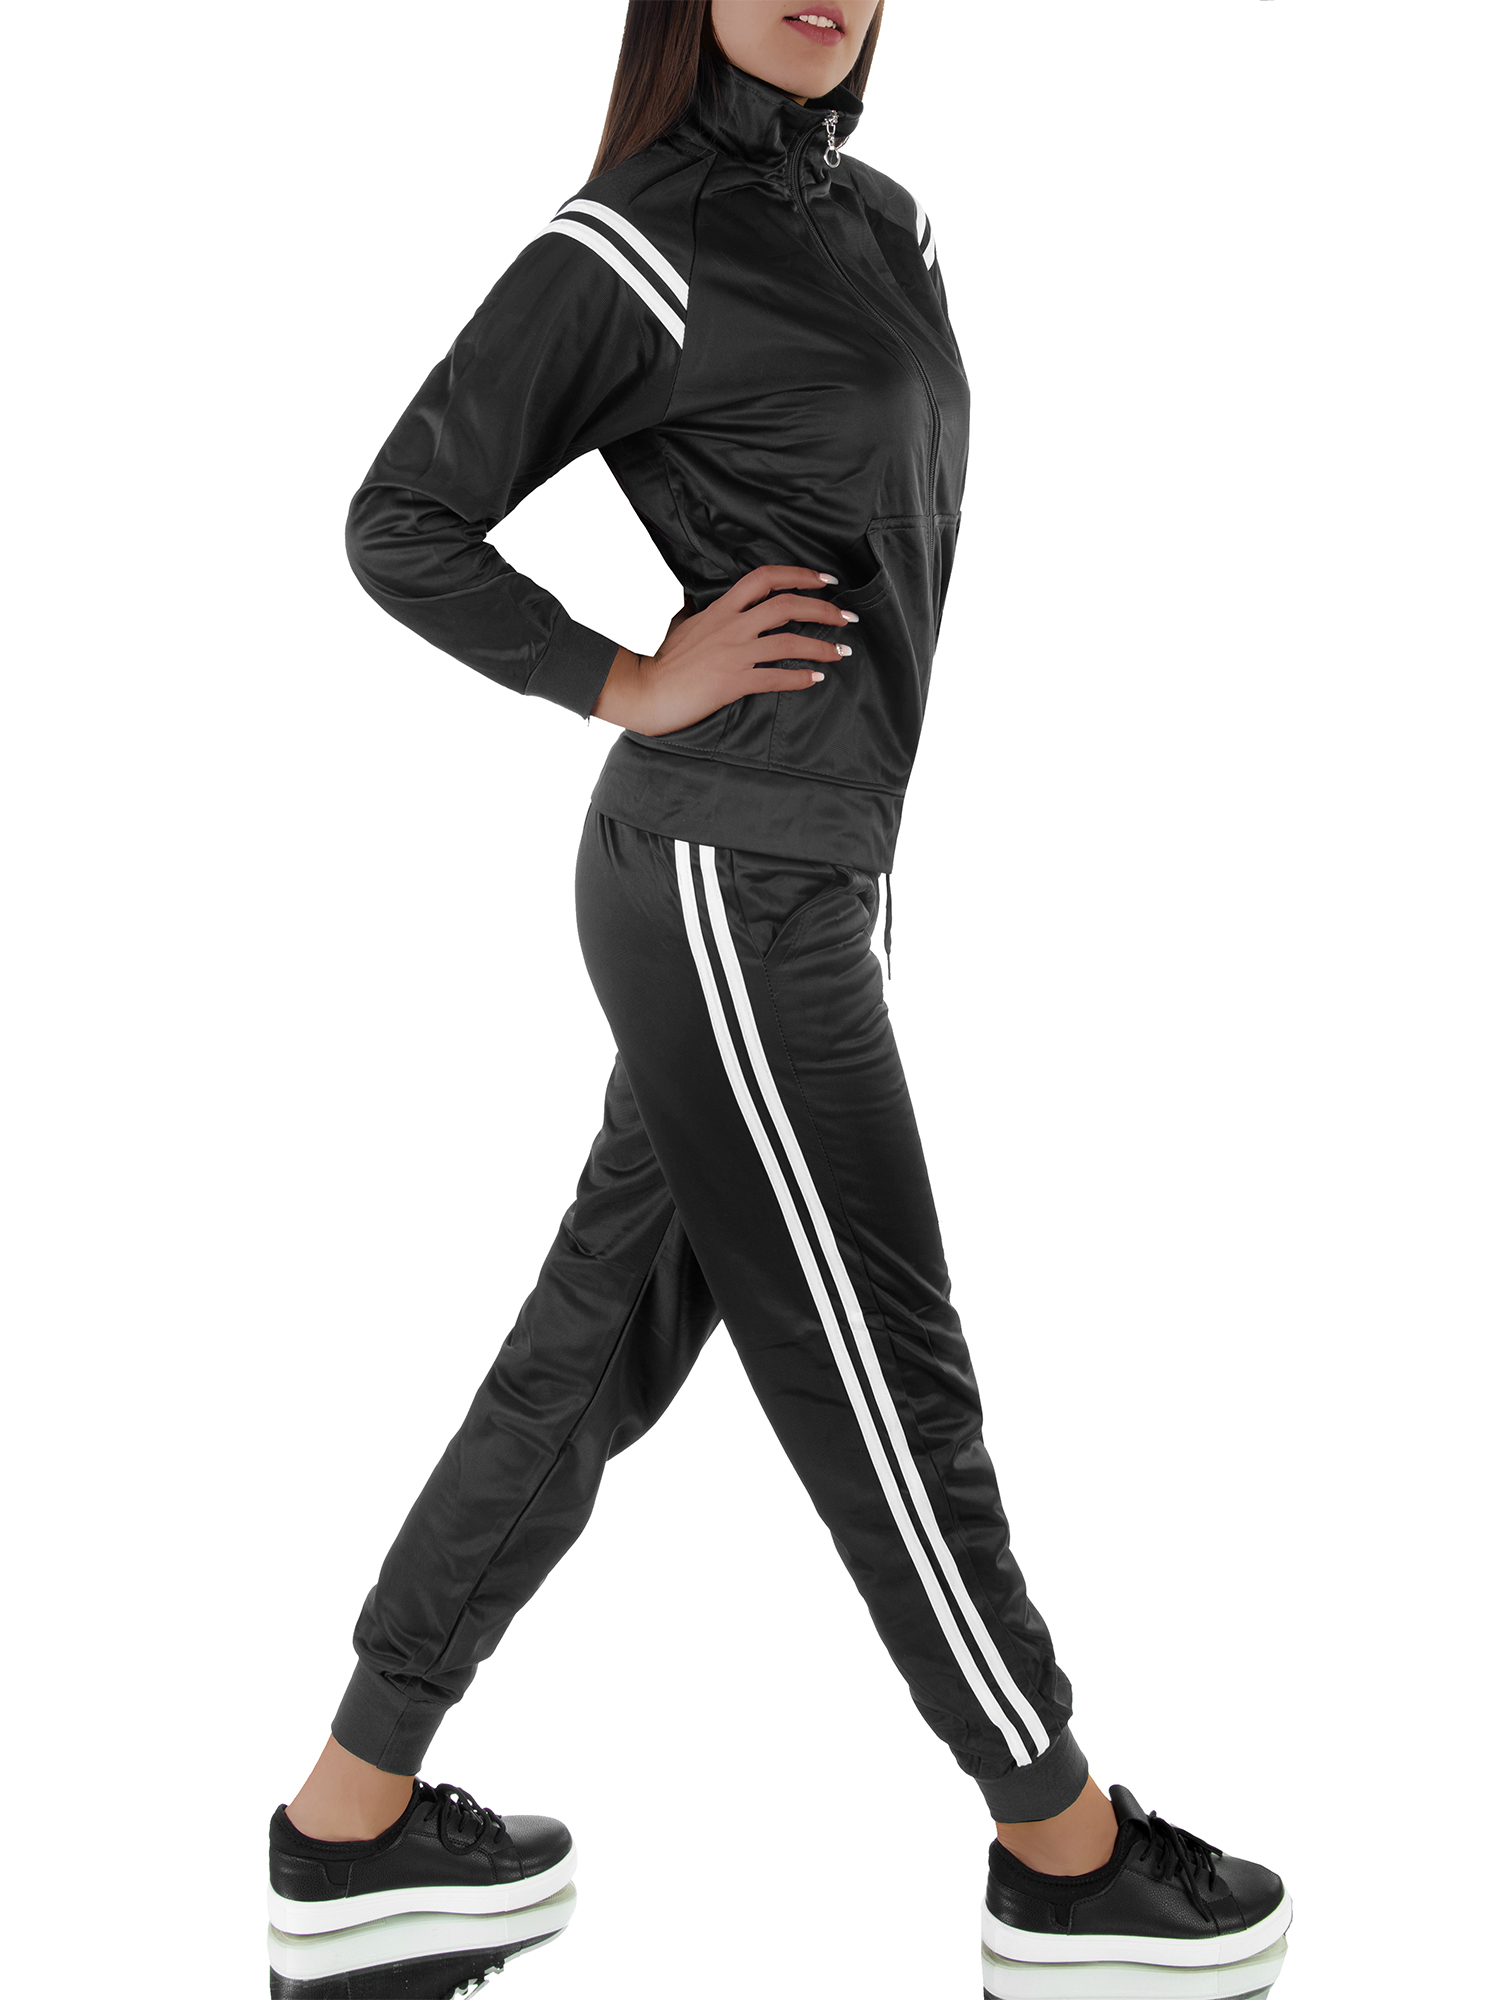 Damen Mickey Mouse Trainingsanzug Jogginghose Pullover Top Sports Laufen Anzug